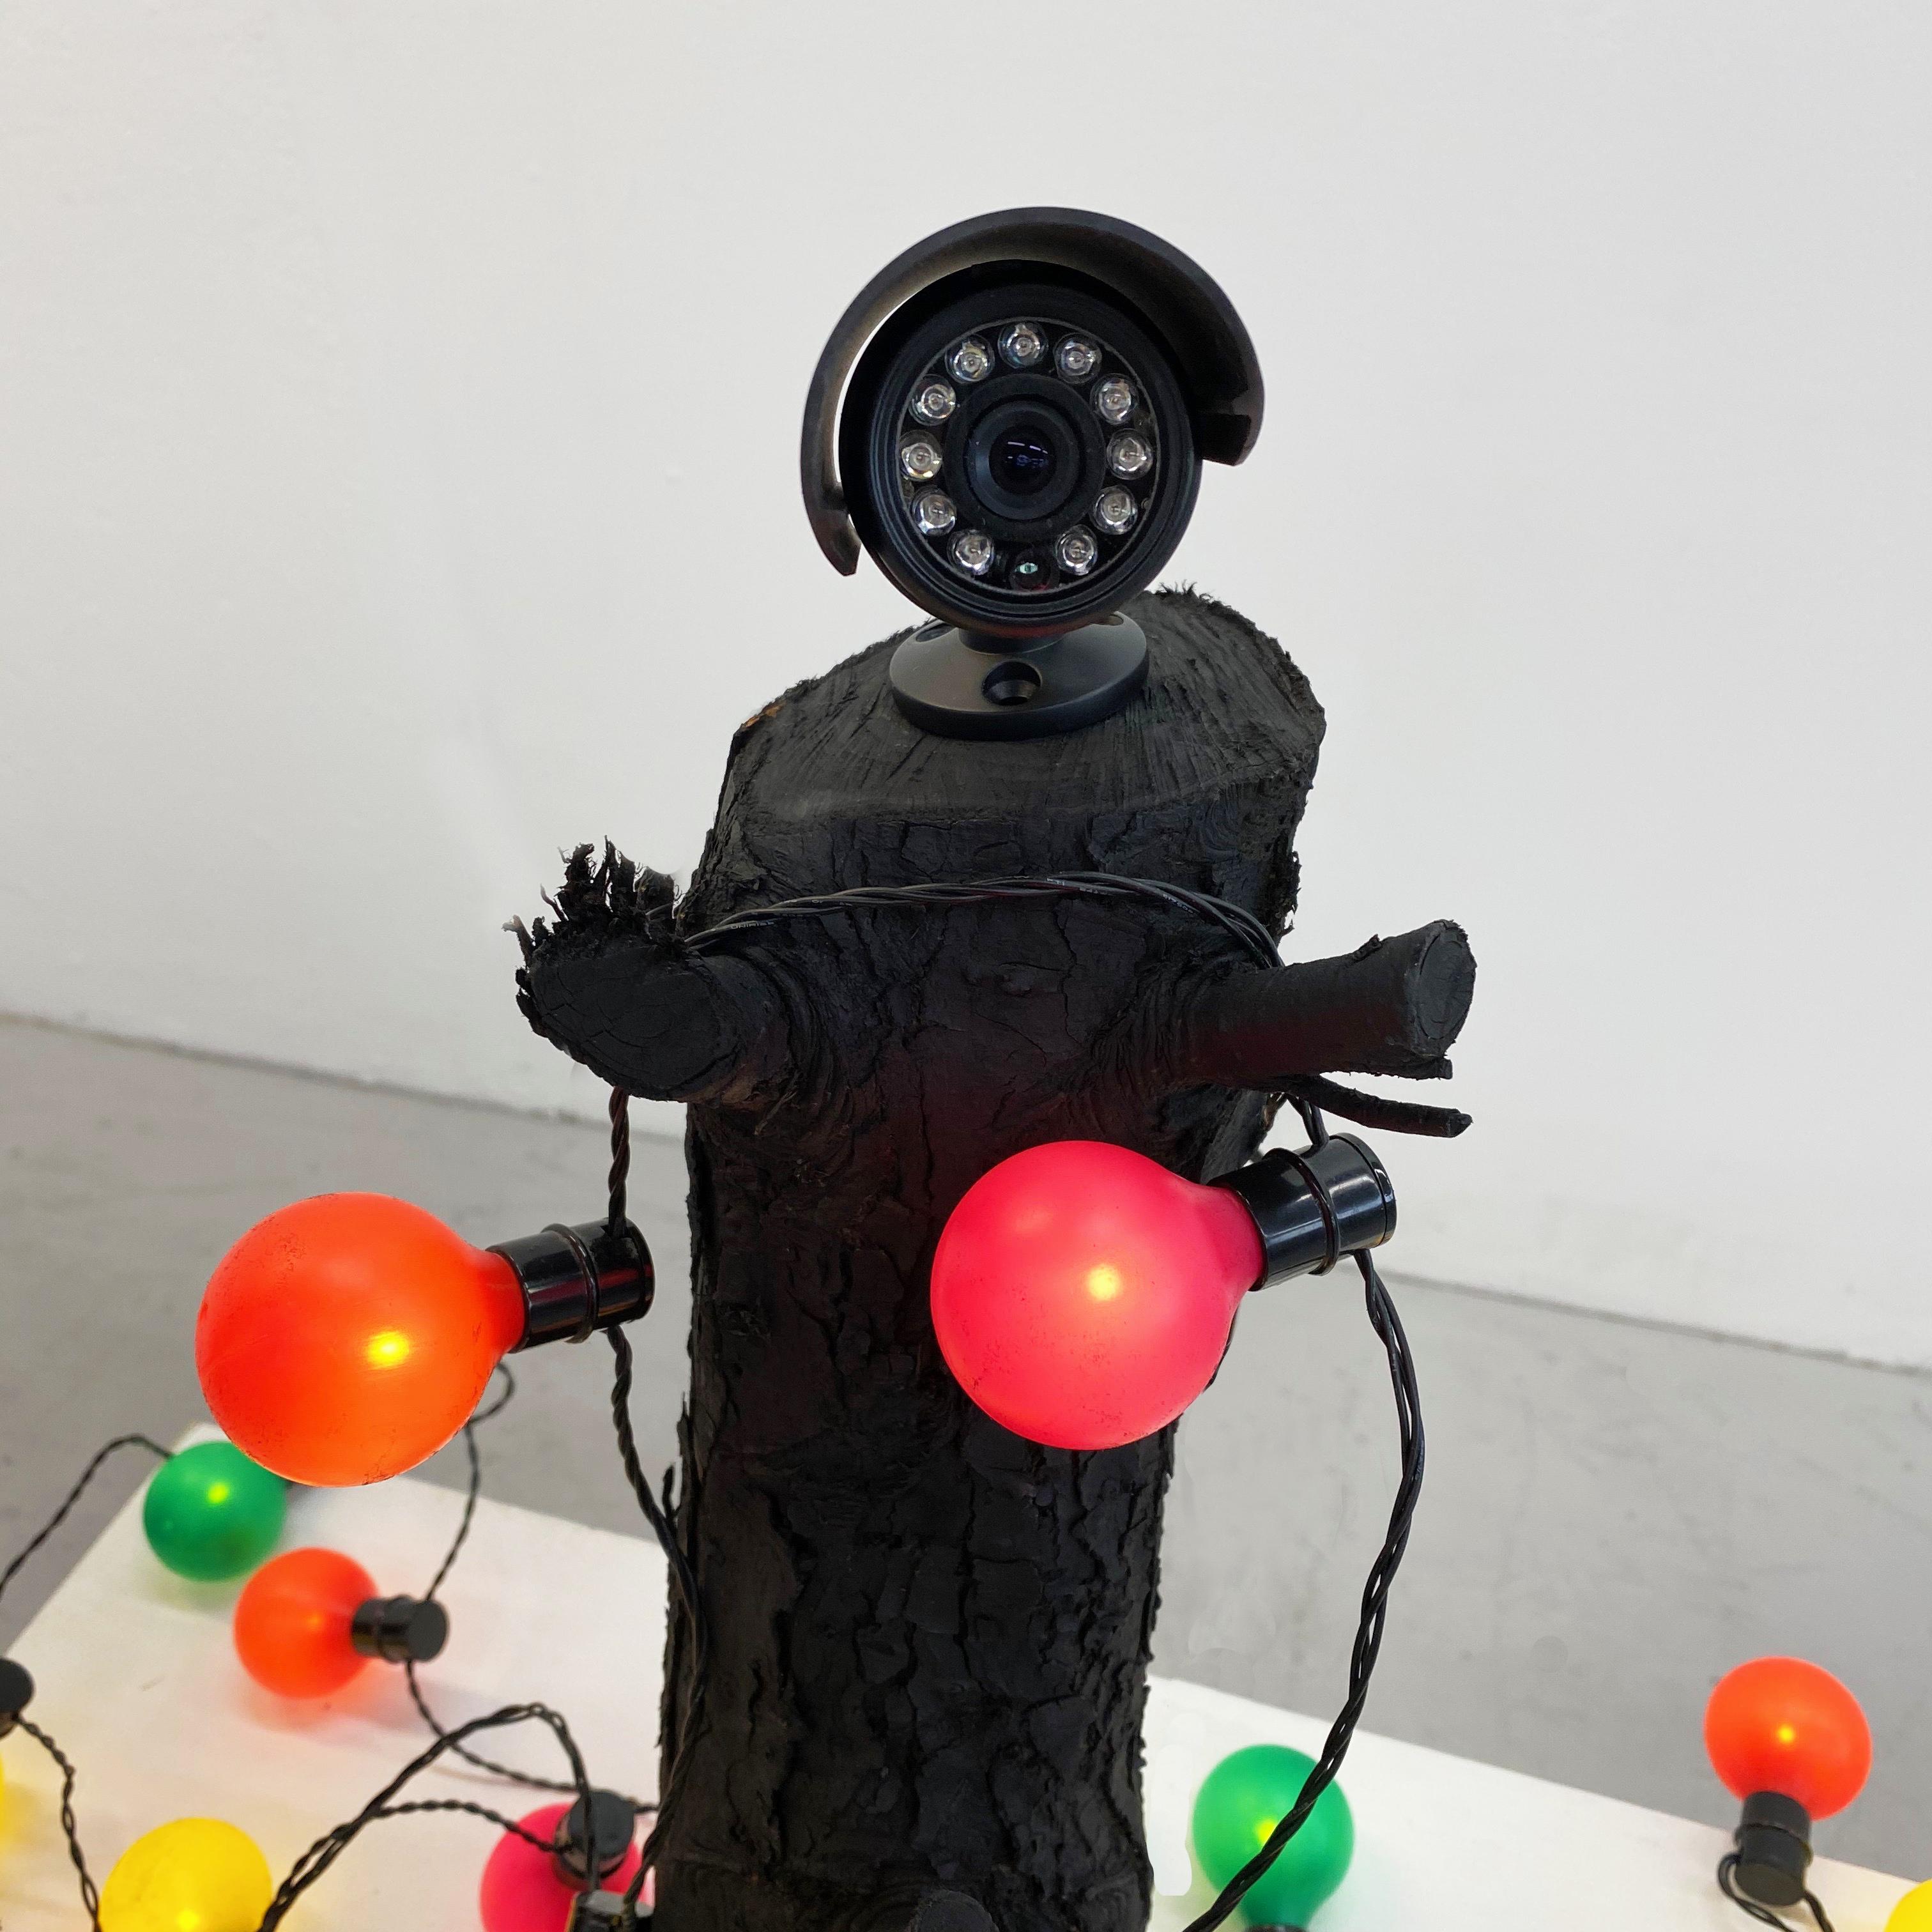 Watching. 2019. CCTV camera, log, festoon lights. Acid etch paint.